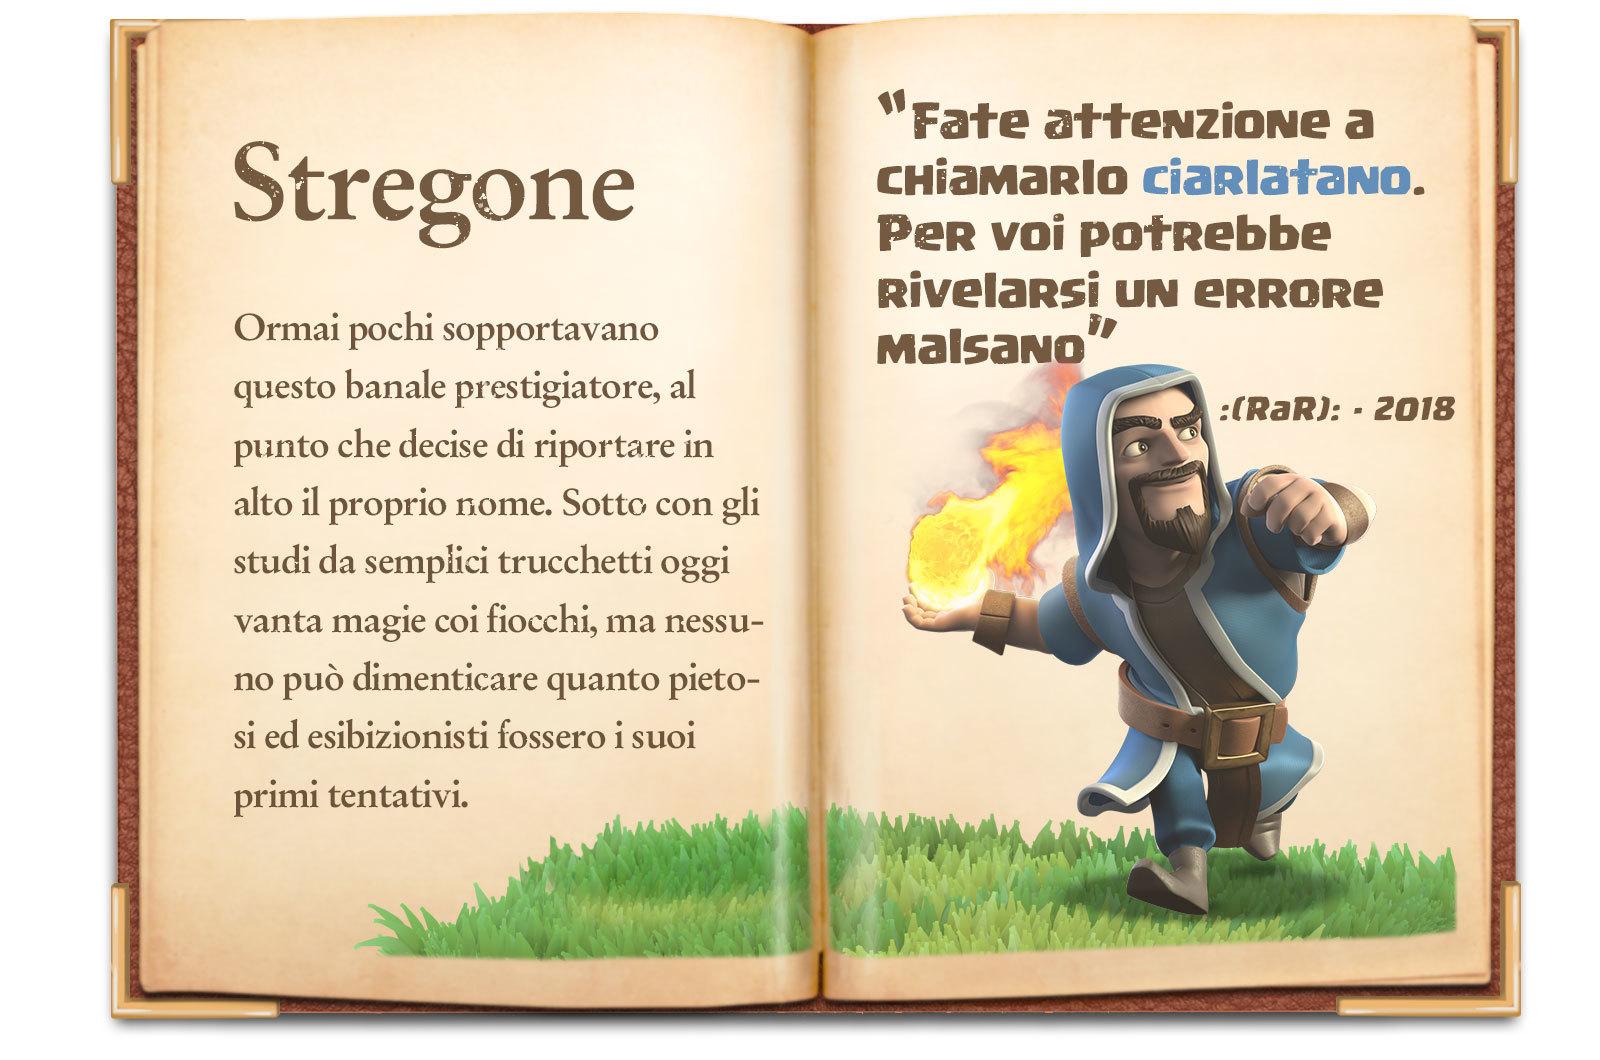 Ita_CoC_Clanslator_Book_1_StregoneFull.jpg?mtime=20180601060645#asset:5857